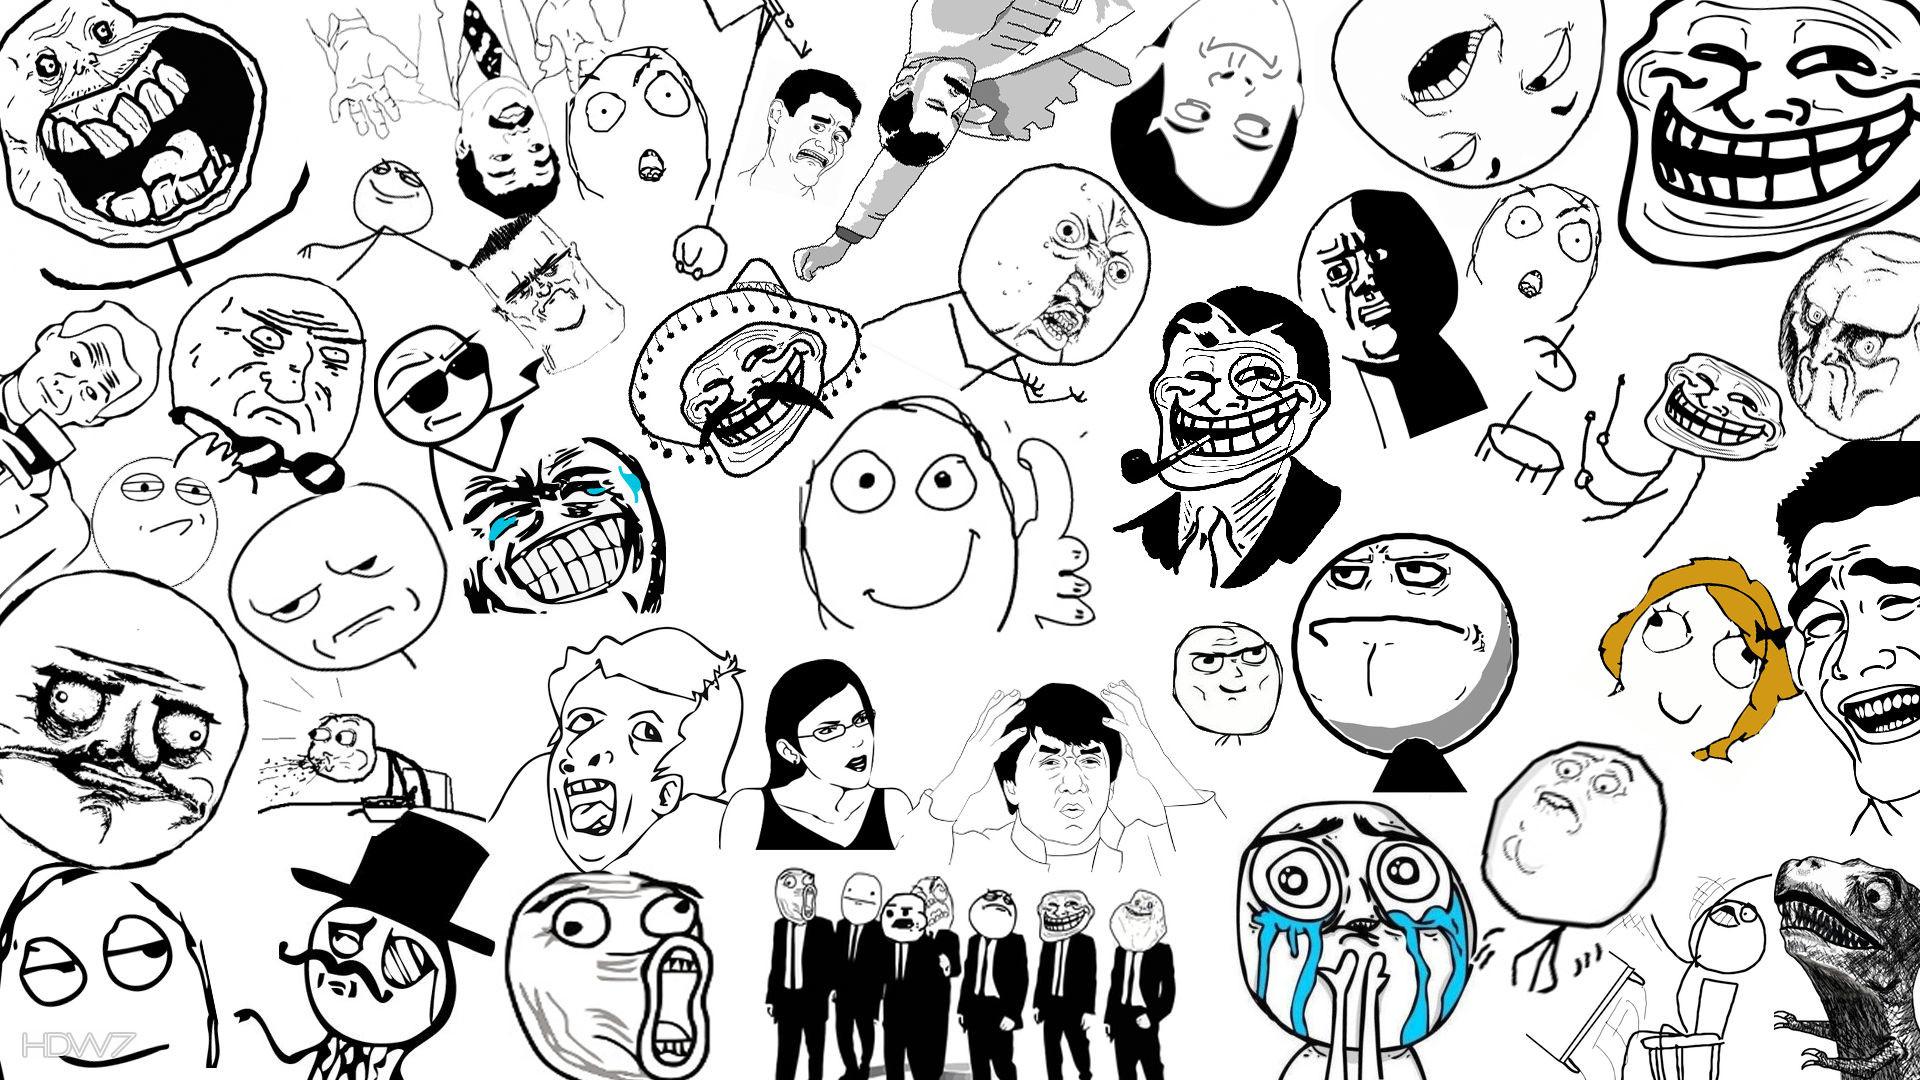 meme memes background hd wallpaper gallery 20